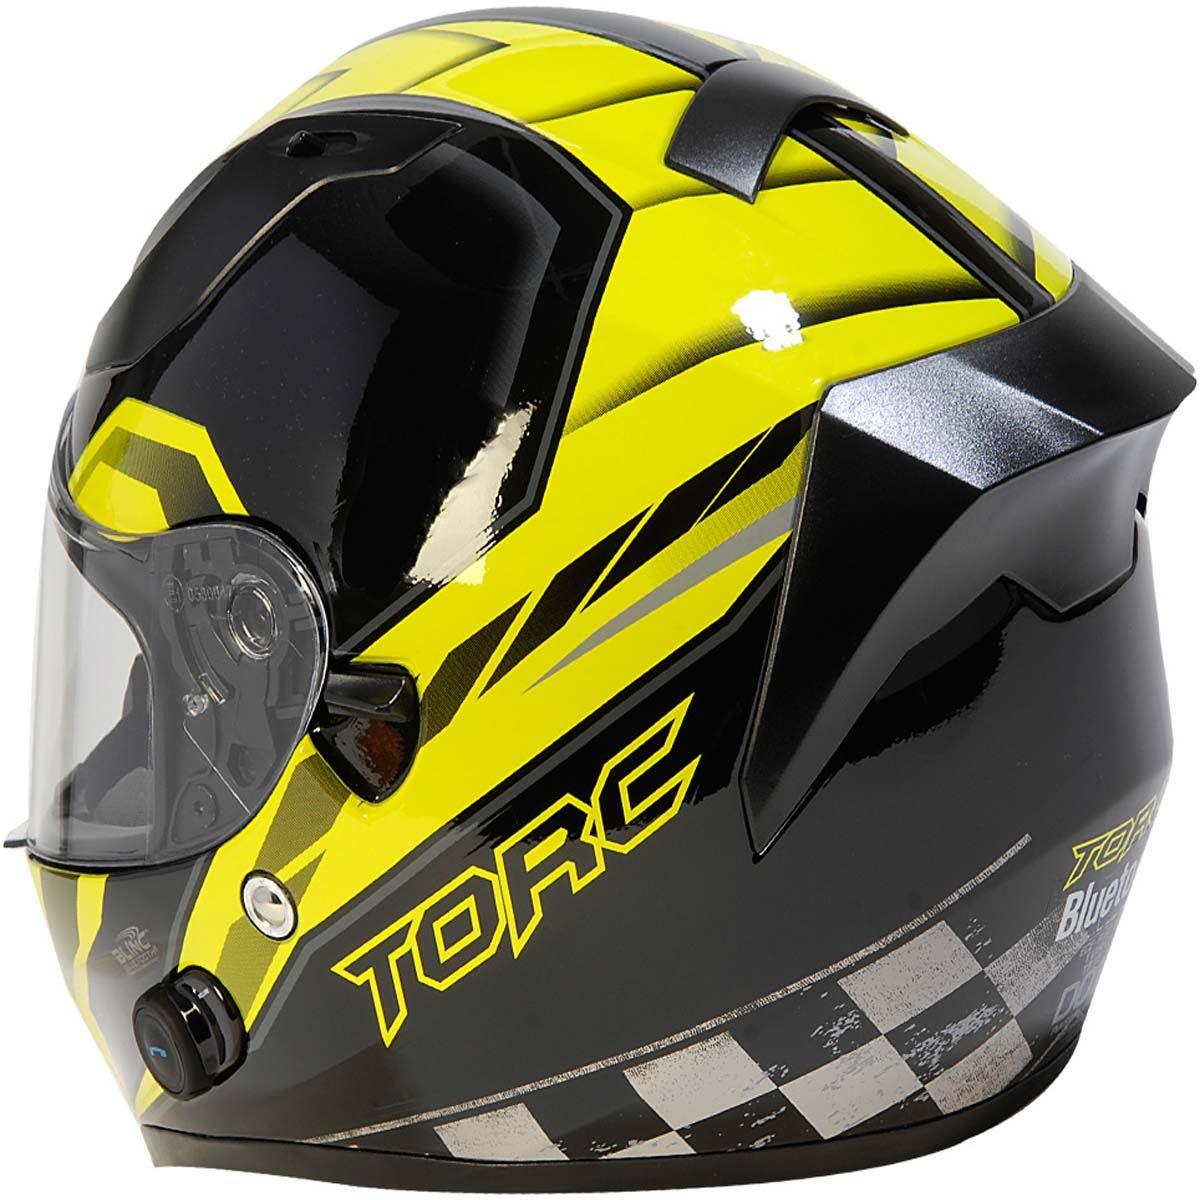 miniature 21 - Torc T15 T15B Helmet Bluetooth Blinc or without - Inner Sun Shield DOT XS-2XL